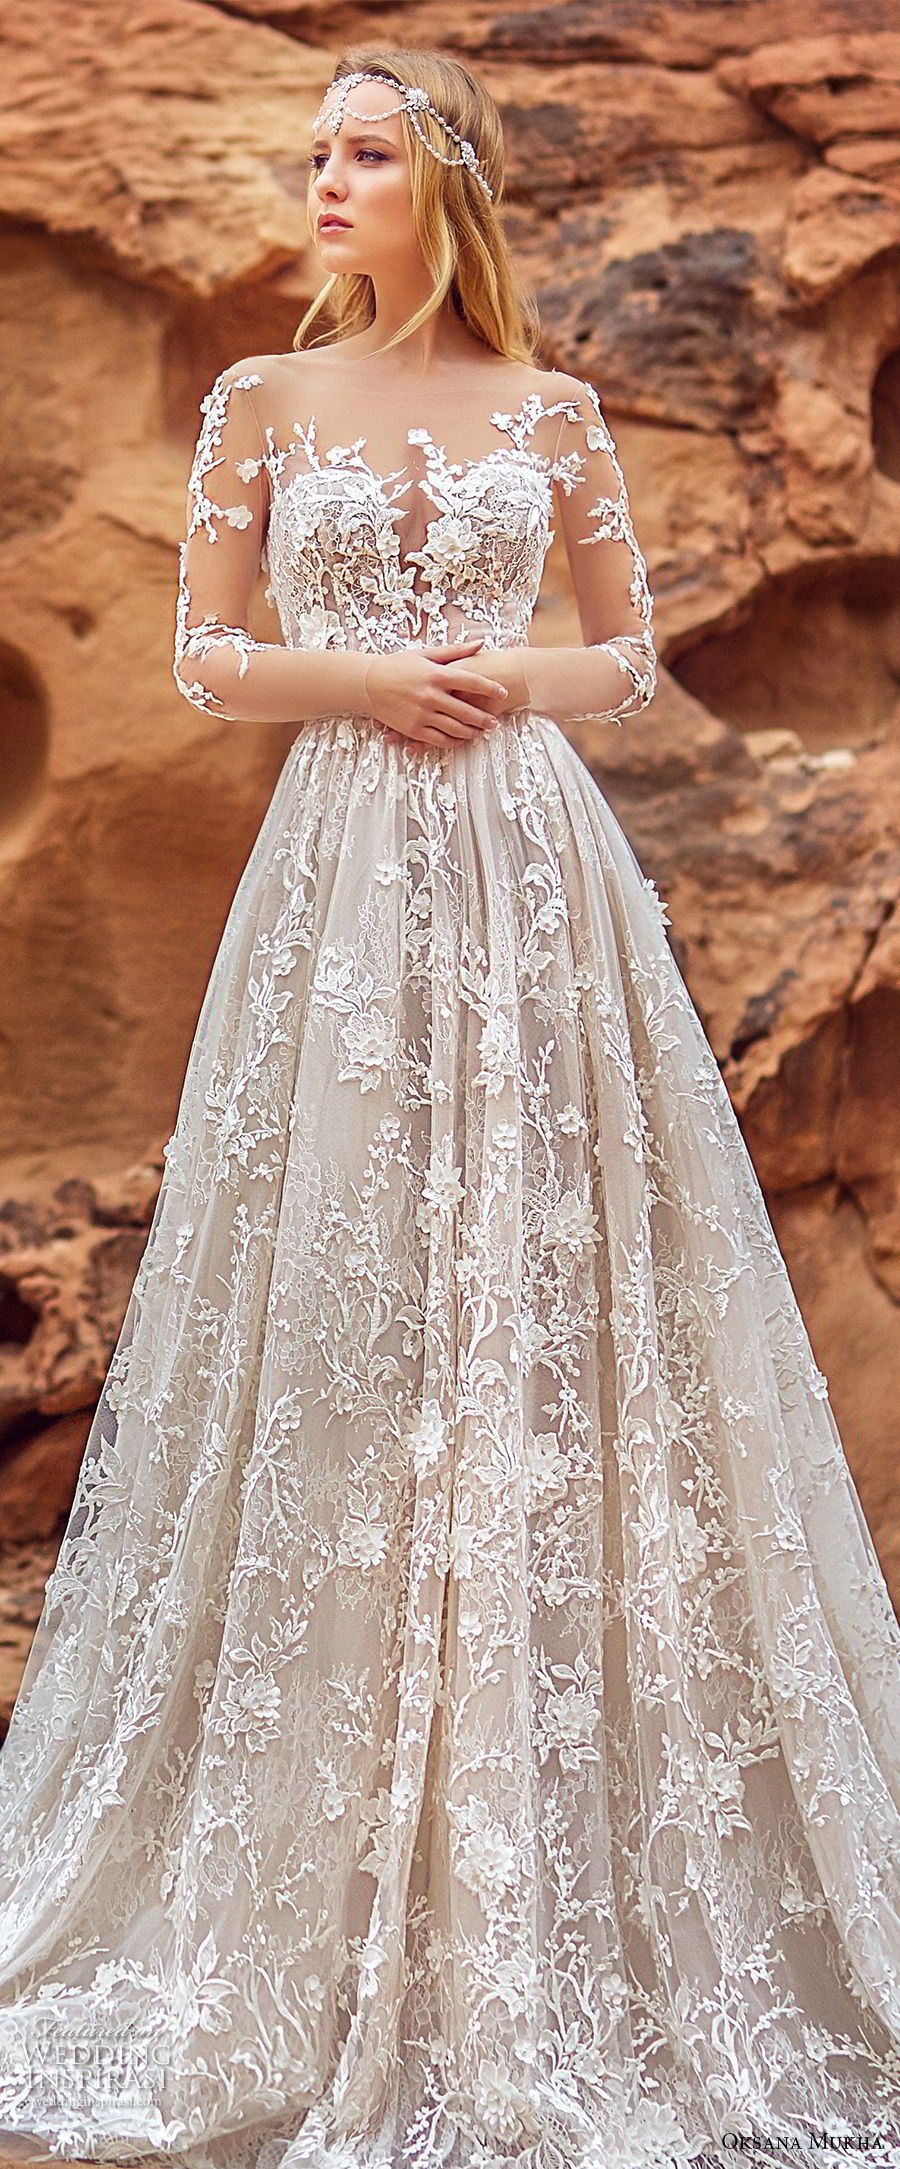 d959746c6395 oksana mukha 2018 bridal three quarter sleeves sweetheart neckline full  embellishment princess a line wedding dress